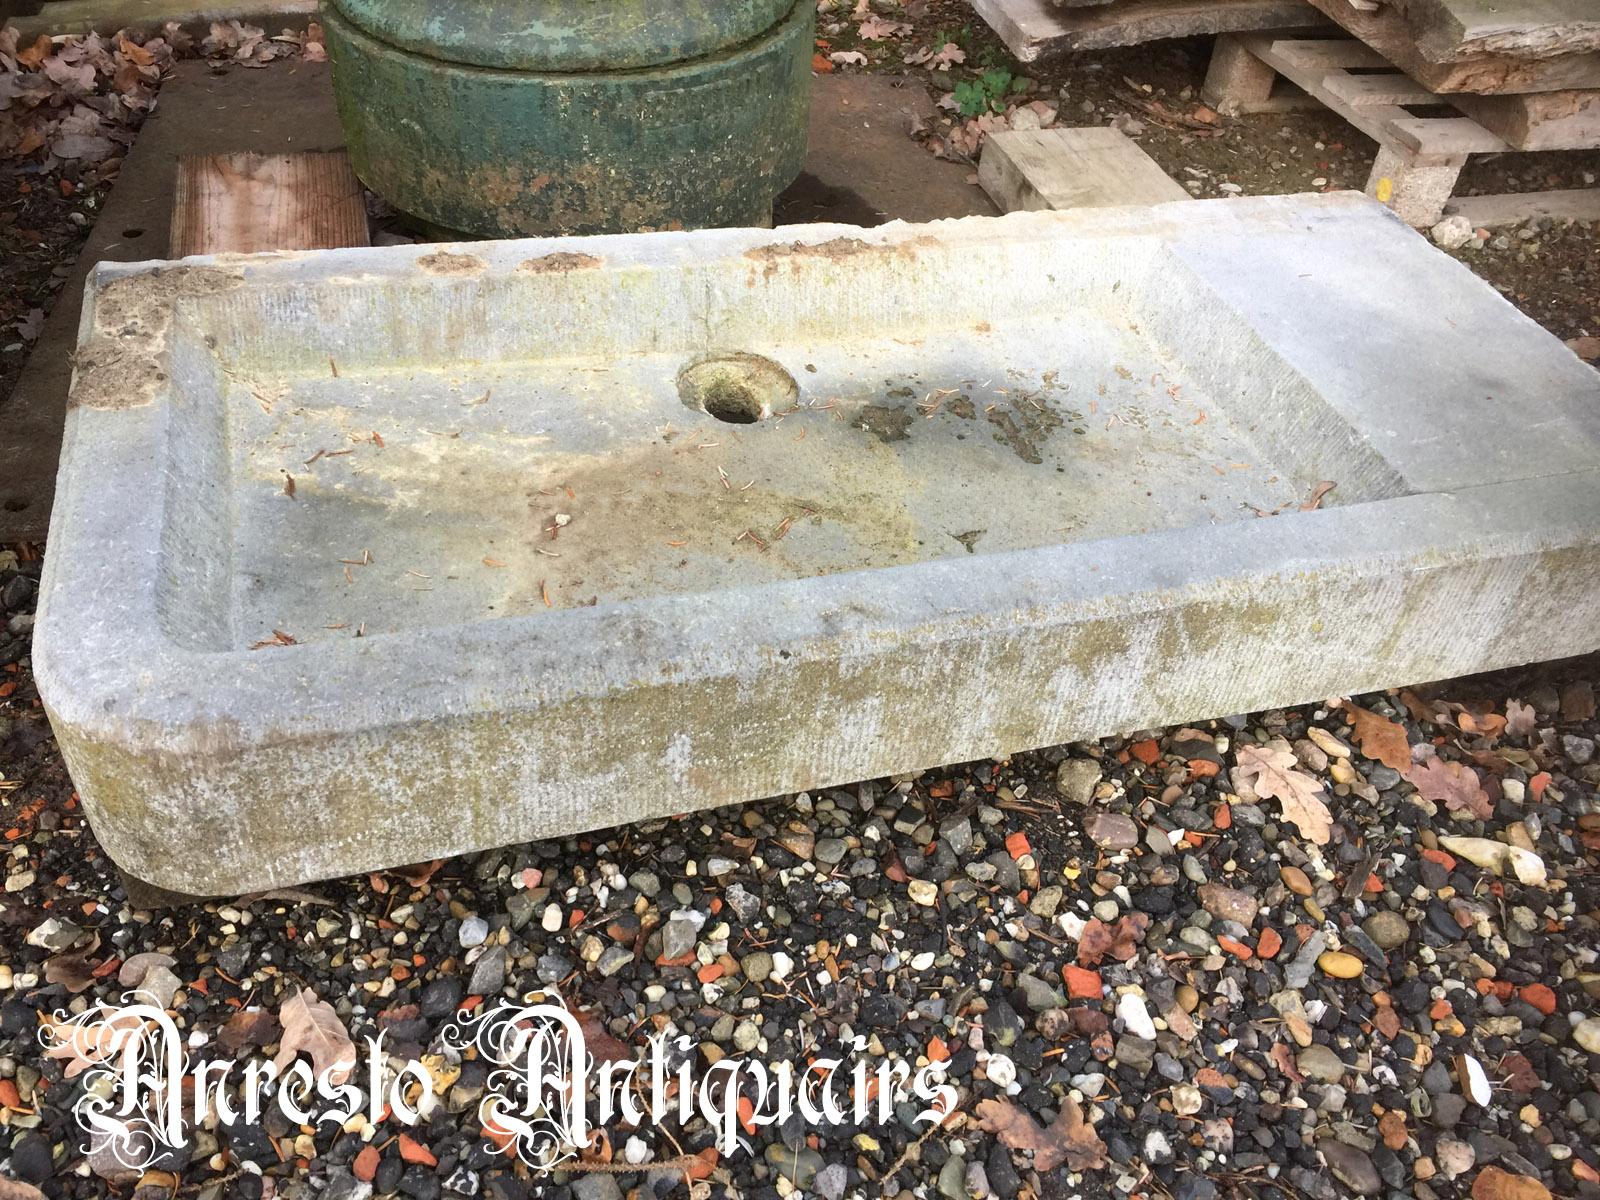 Ref. 36 – Antieke arduinen spoelbak, oude arduinen wasbak